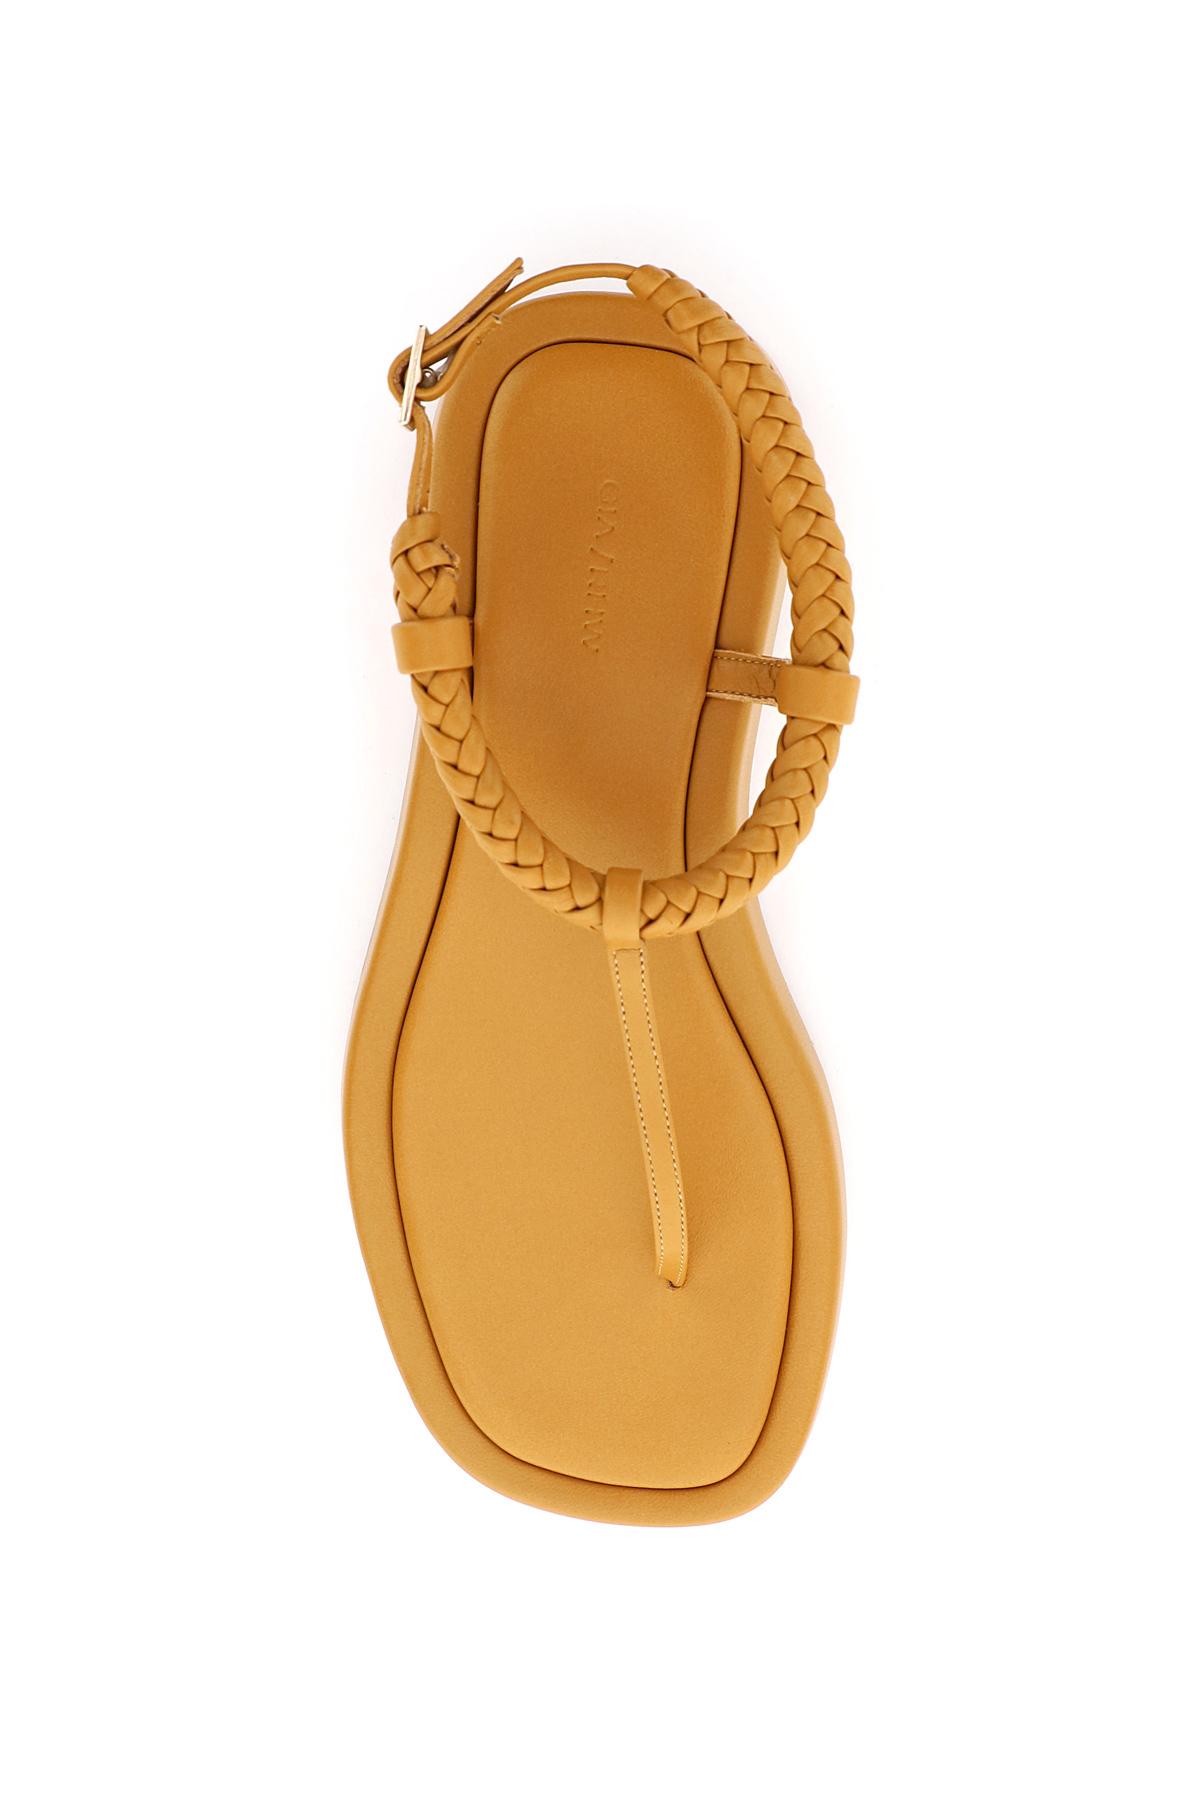 Gia rhw sandali infradito rosie 3